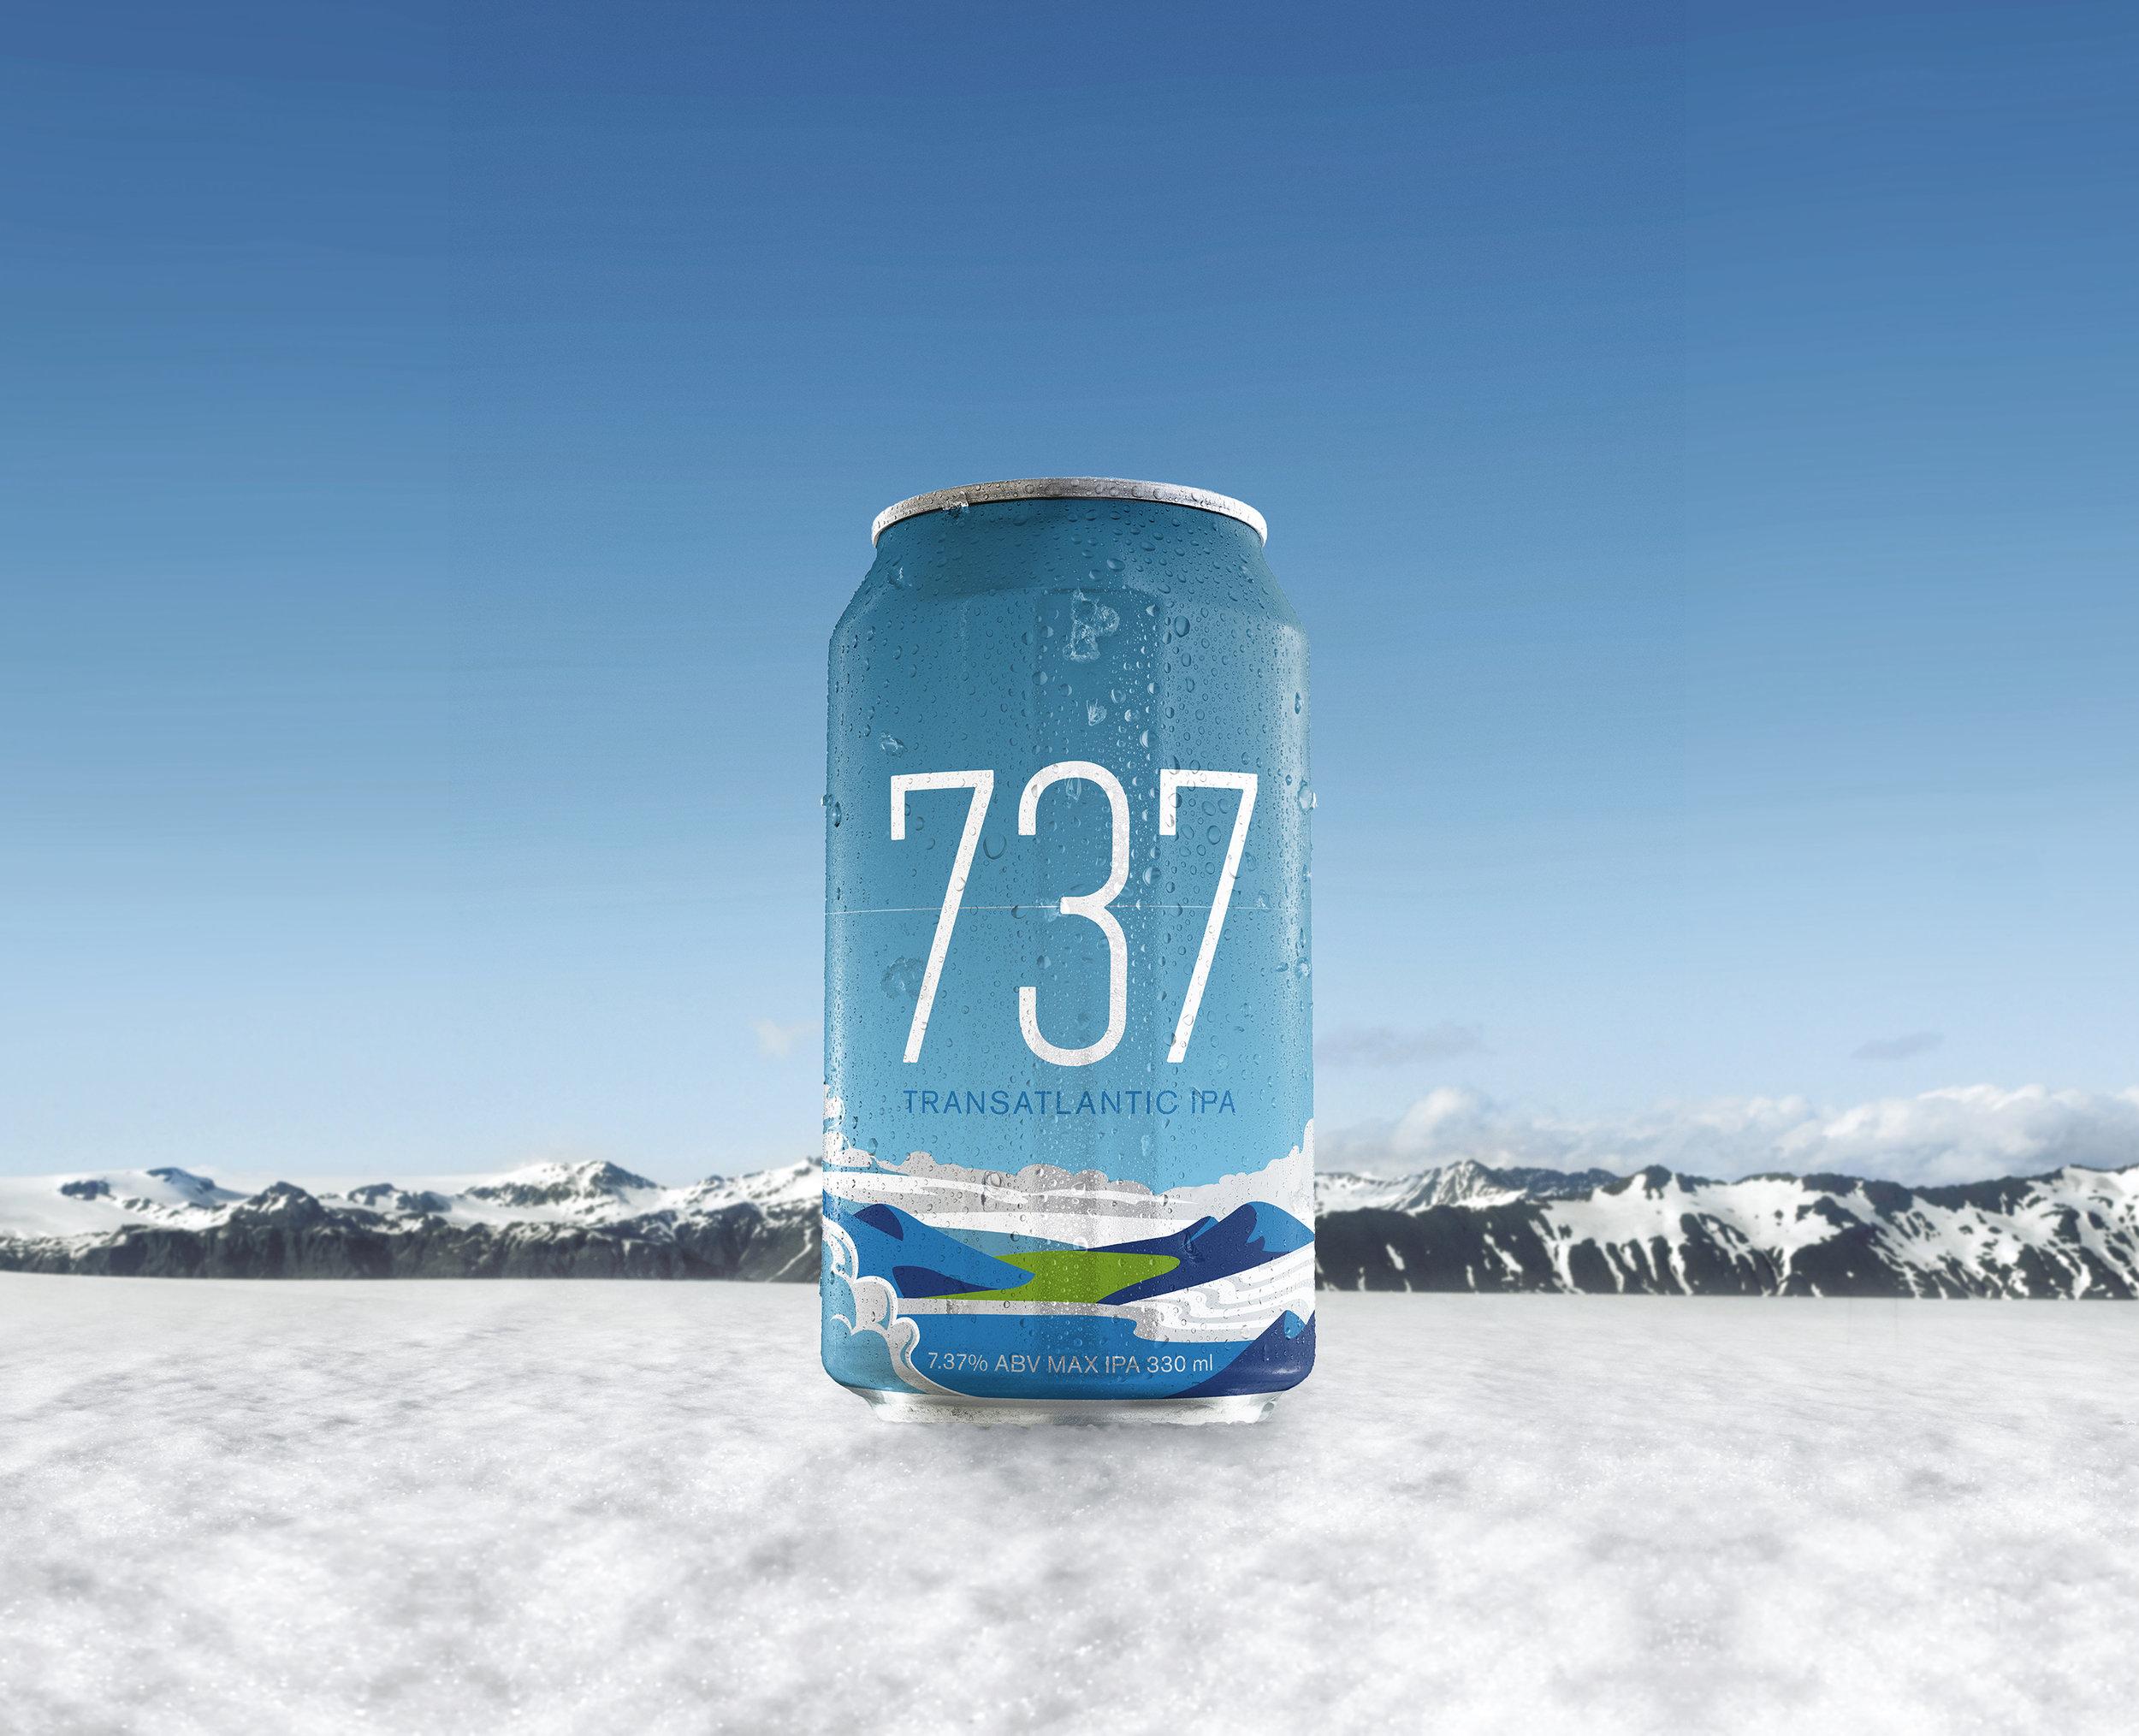 ICE 87340_737bjor_mockup_landscape-sm.jpg